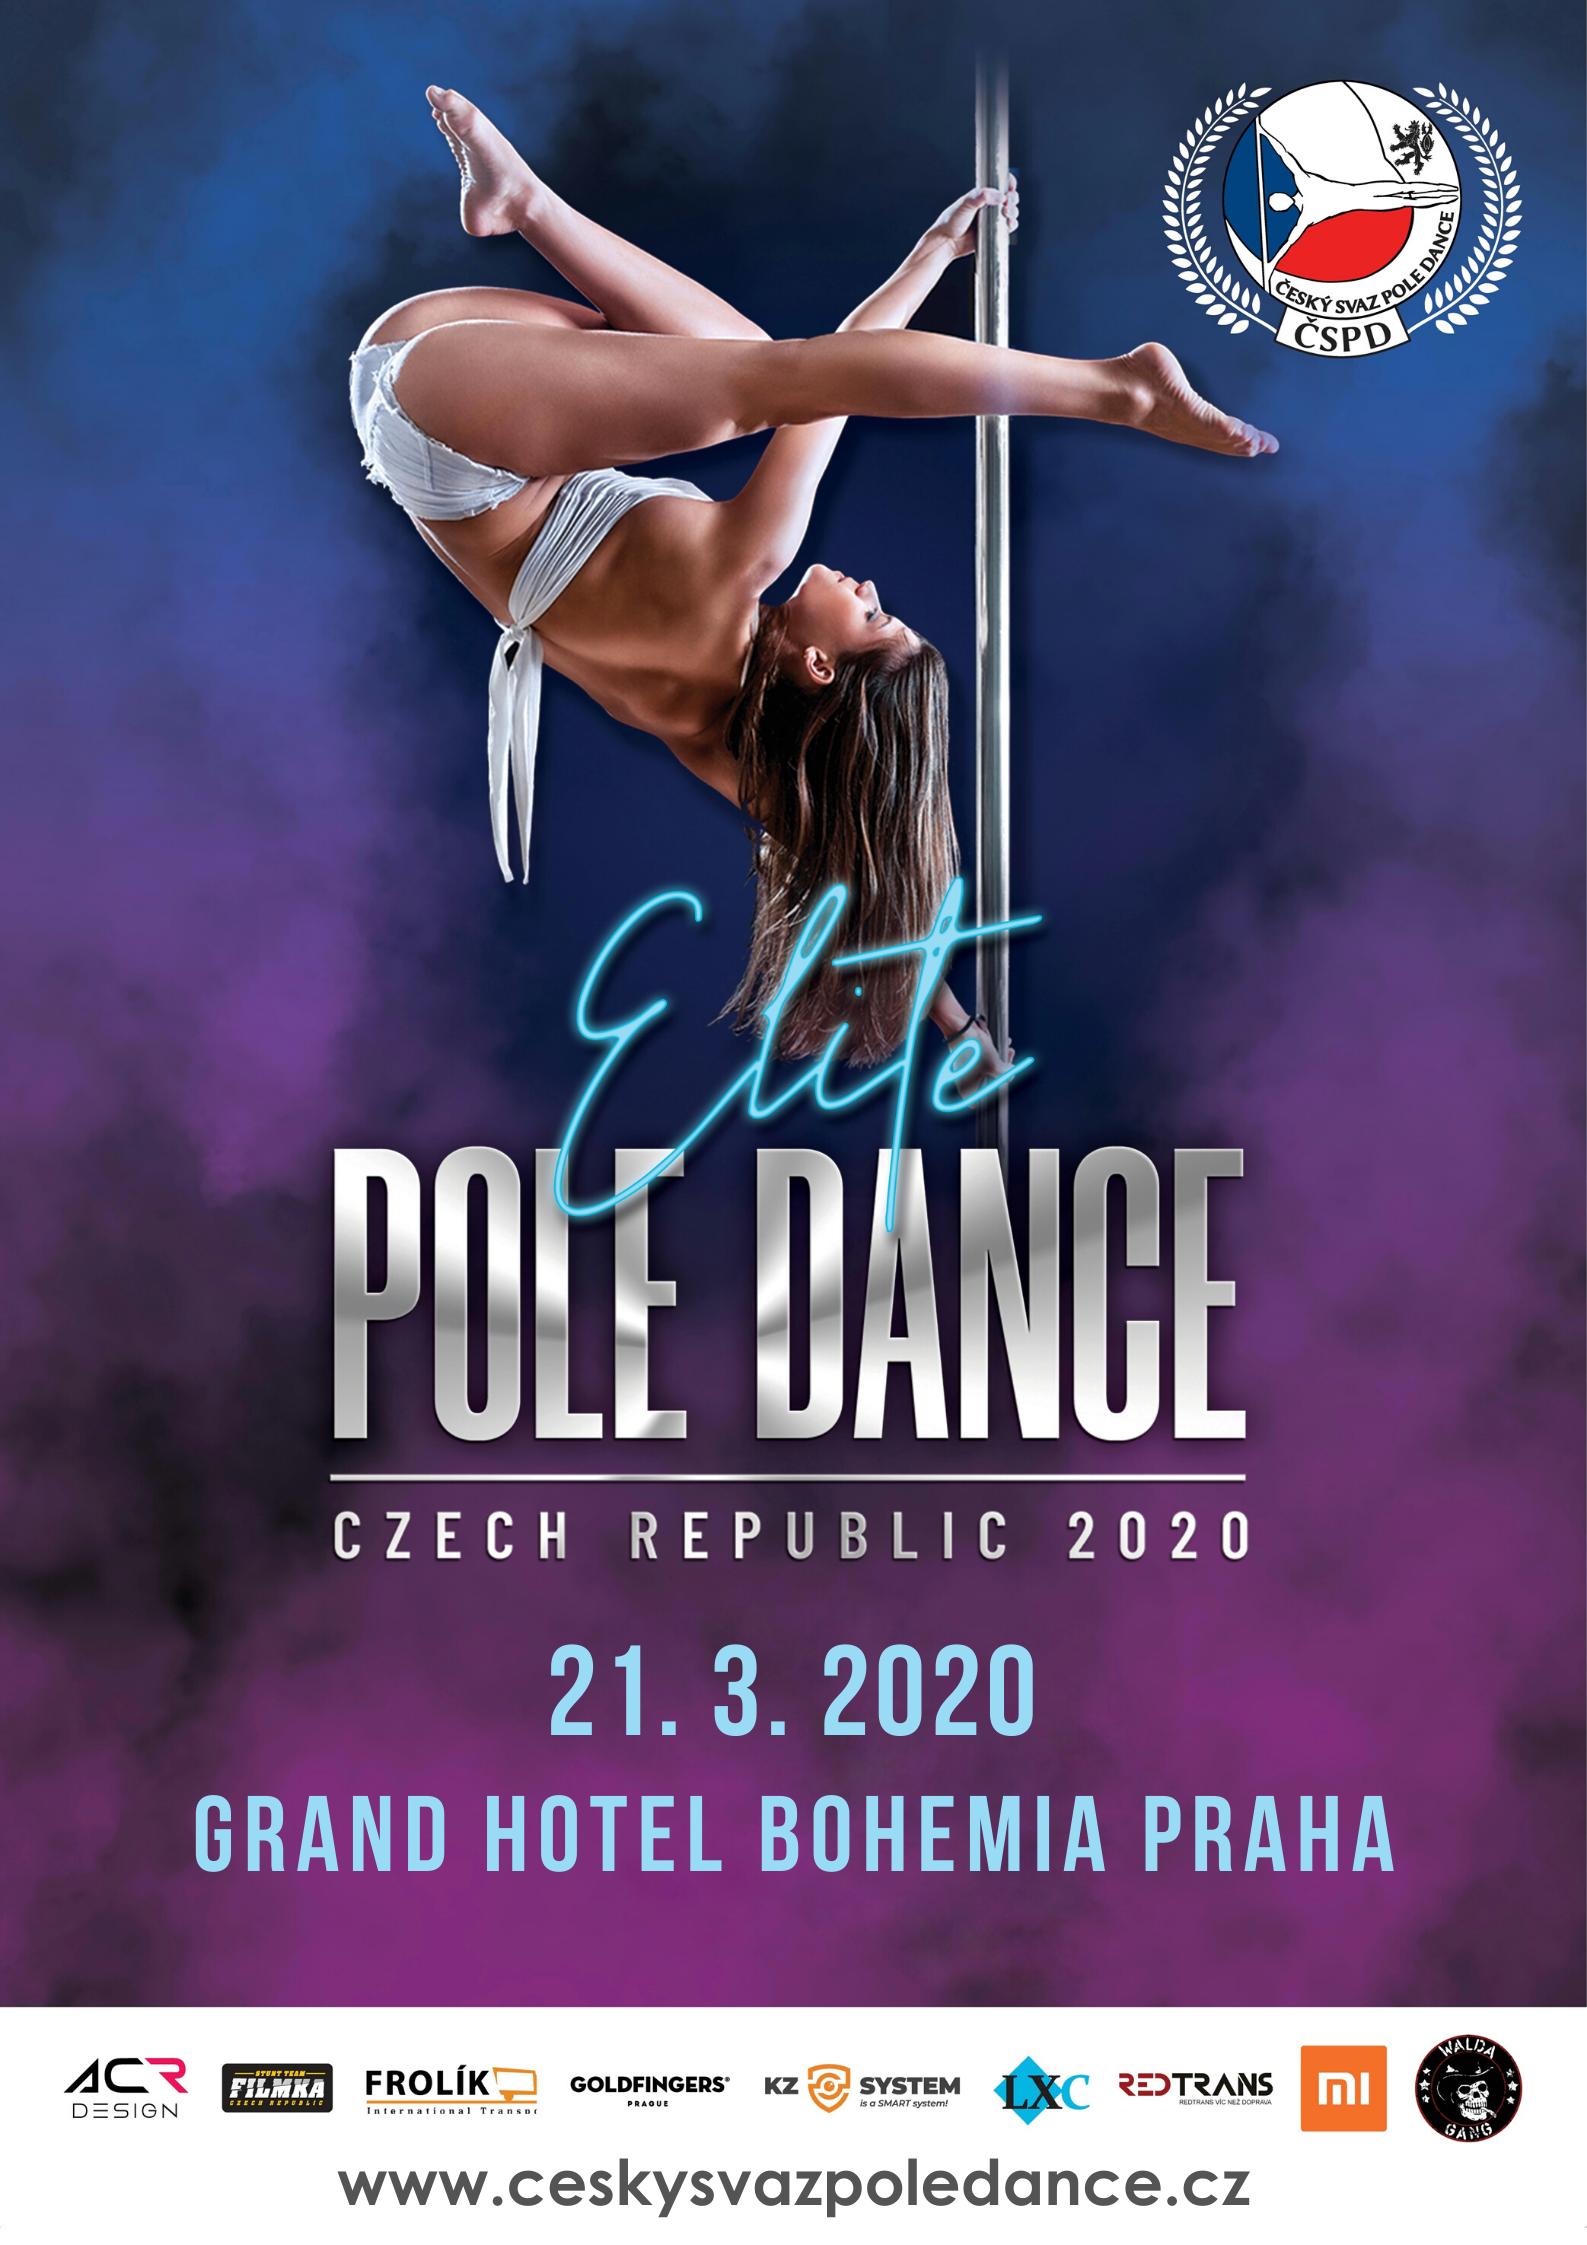 Elite Pole Dance ČR soutěž pole dance česká republika grand hotel bohemia praha pole sport pole art battle